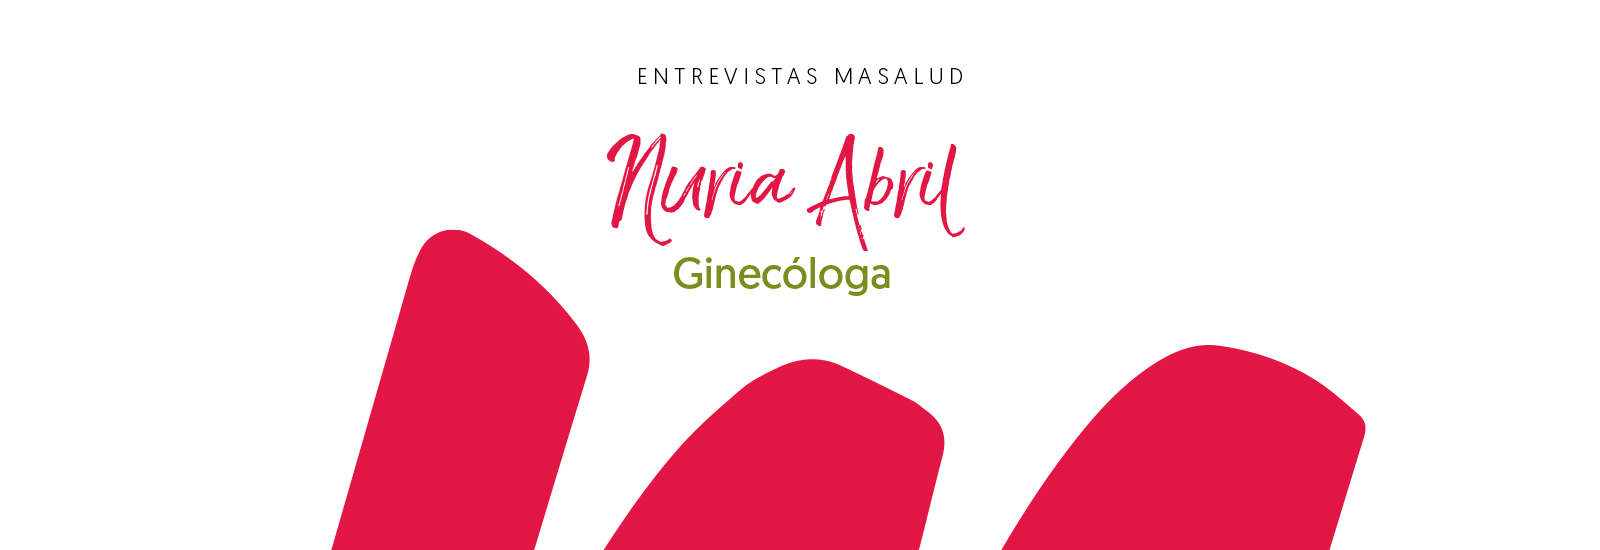 Entrevista Nuria Abril, Ginecóloga